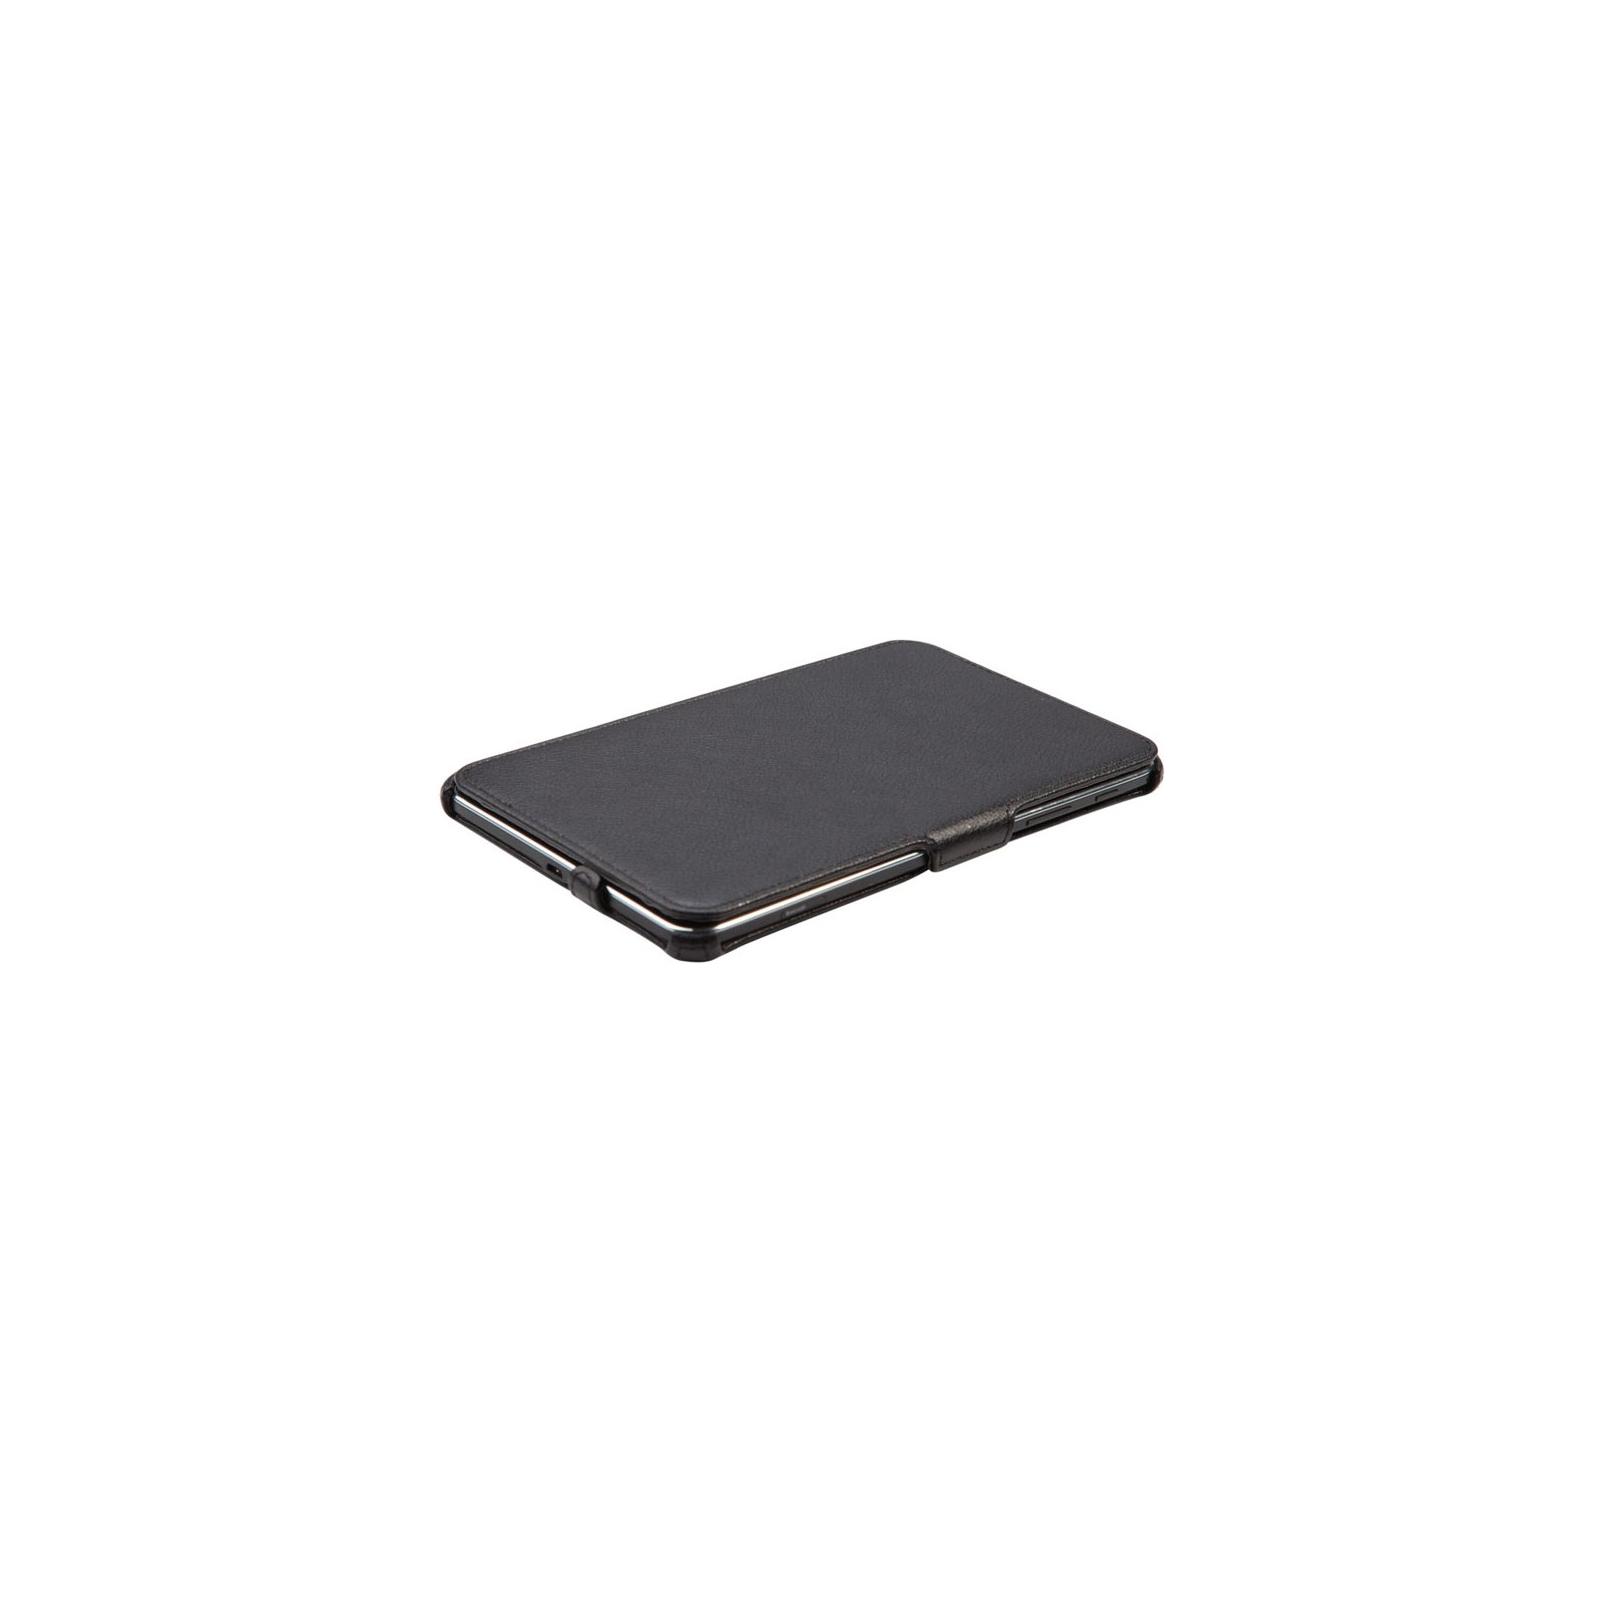 Чехол для планшета AirOn для Samsung GALAXY Tab 4 8.0 black (6946795850168) изображение 6